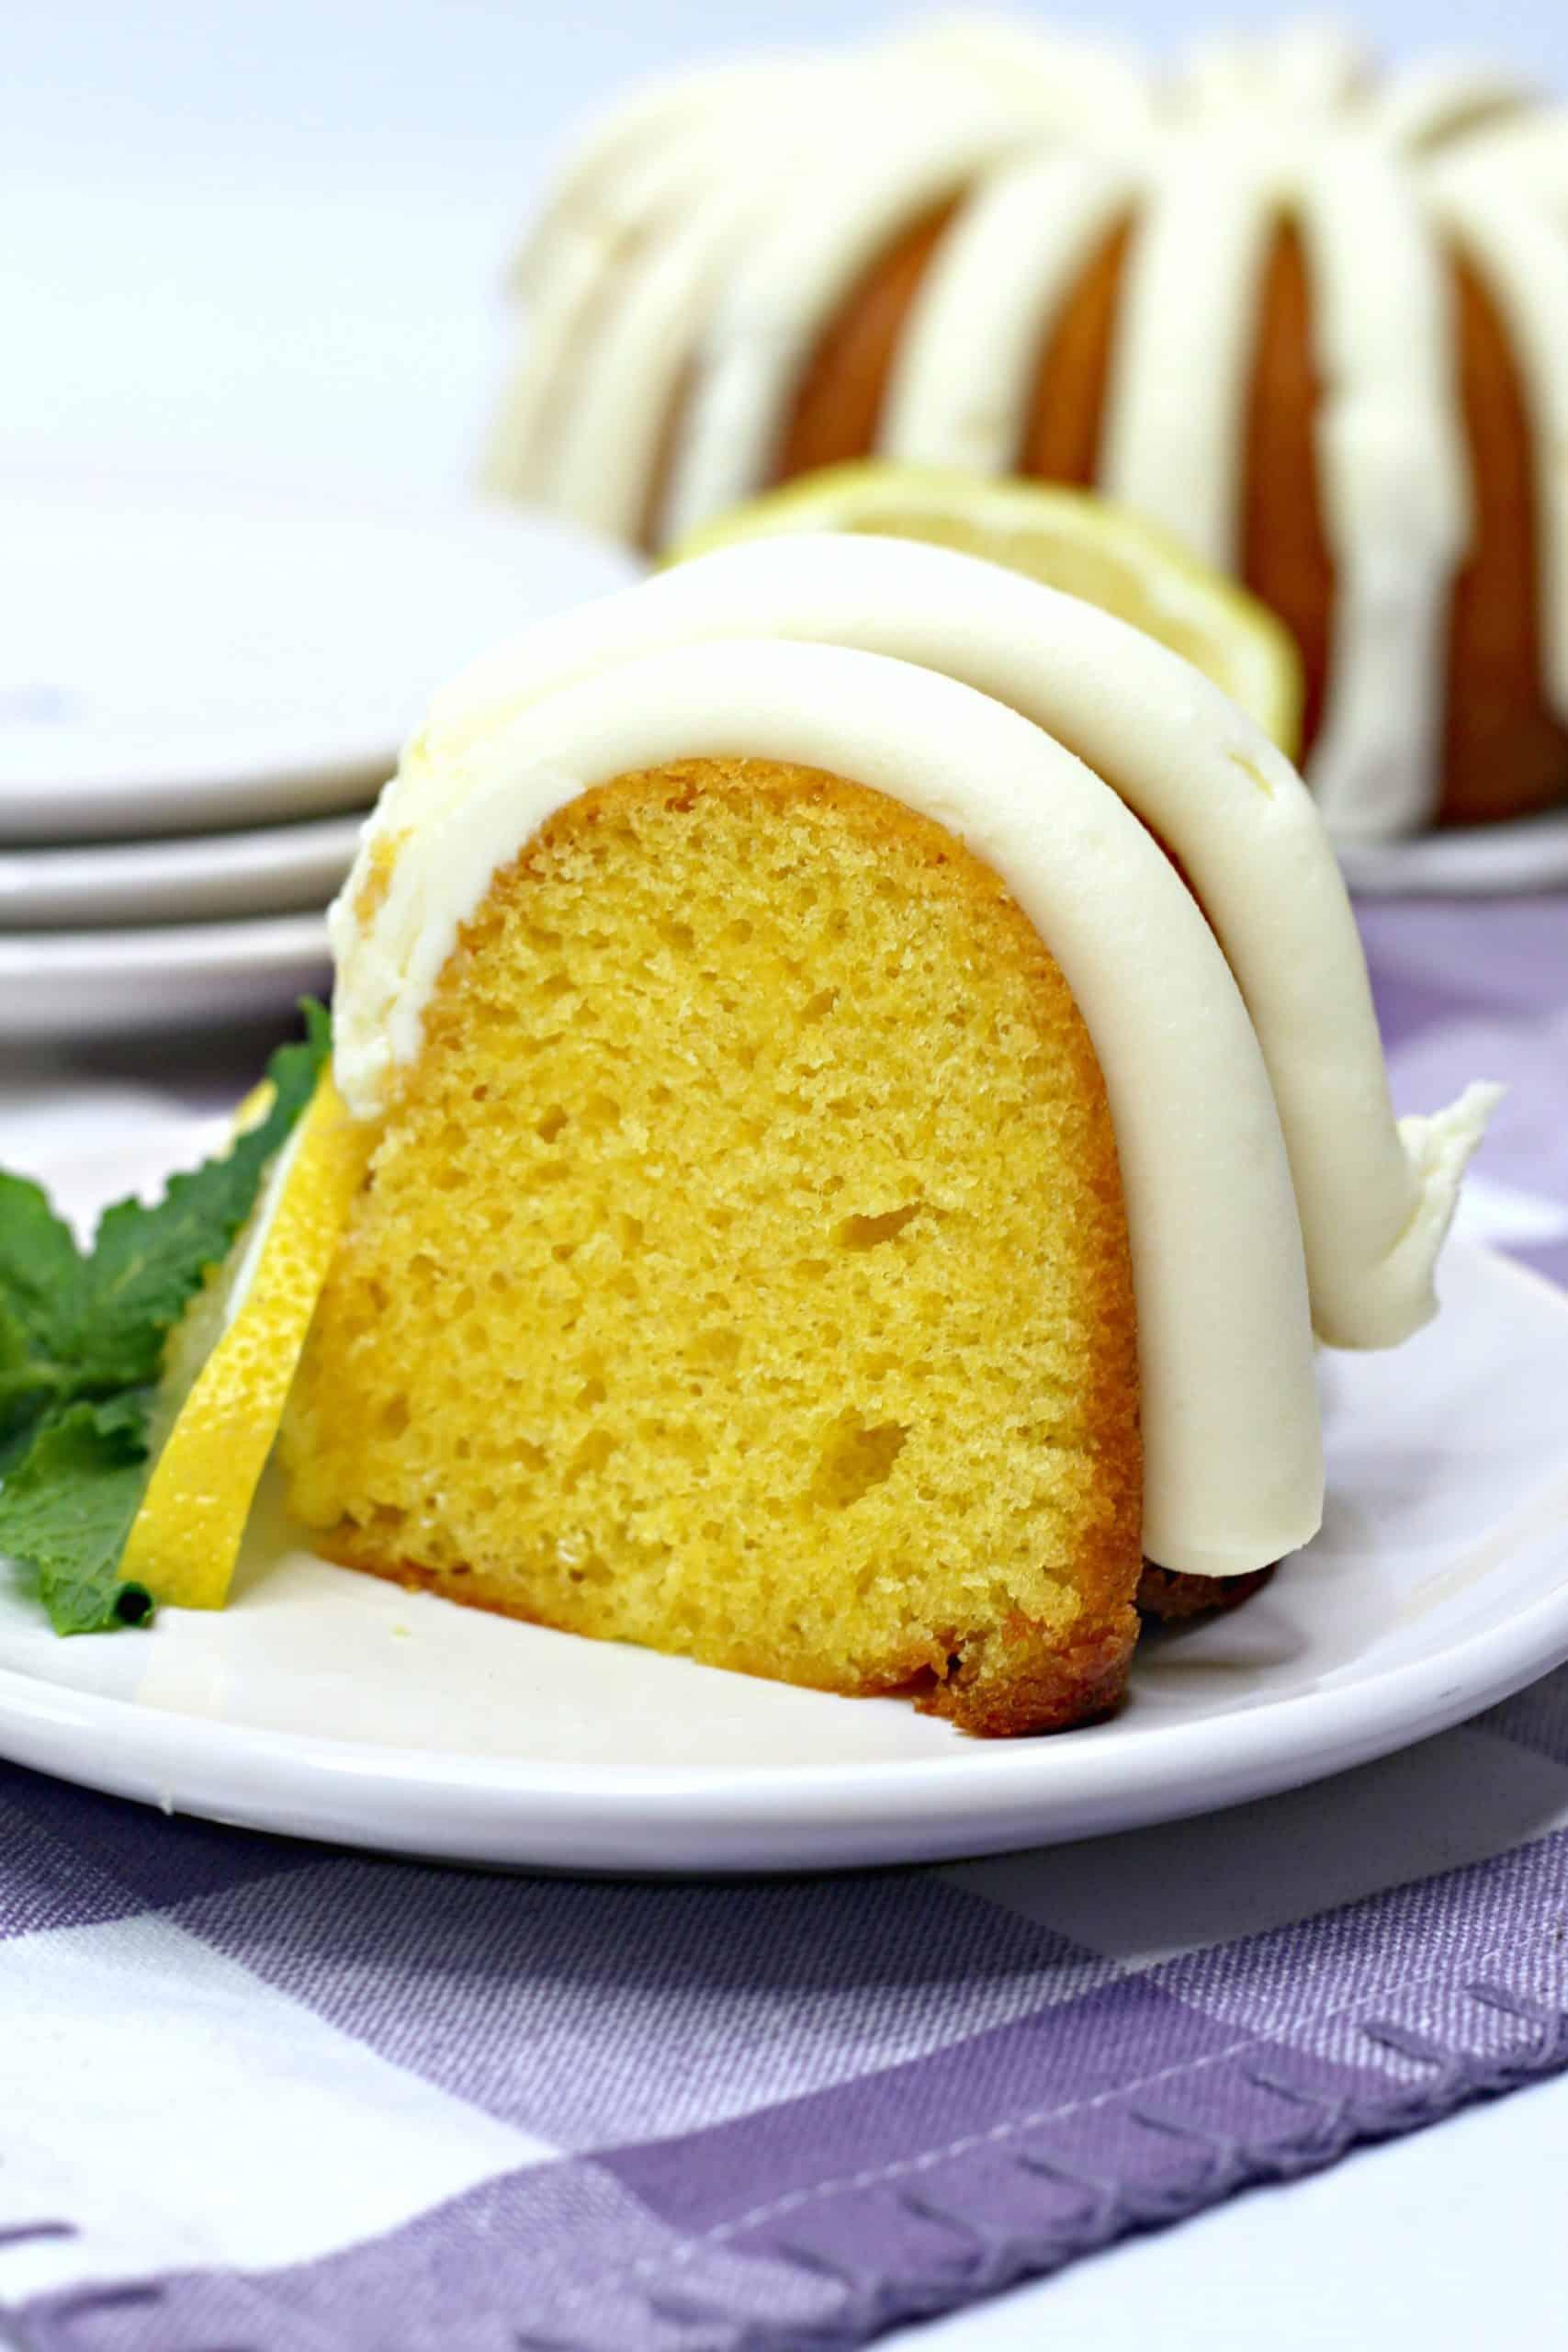 Slice of lemon bundt cake